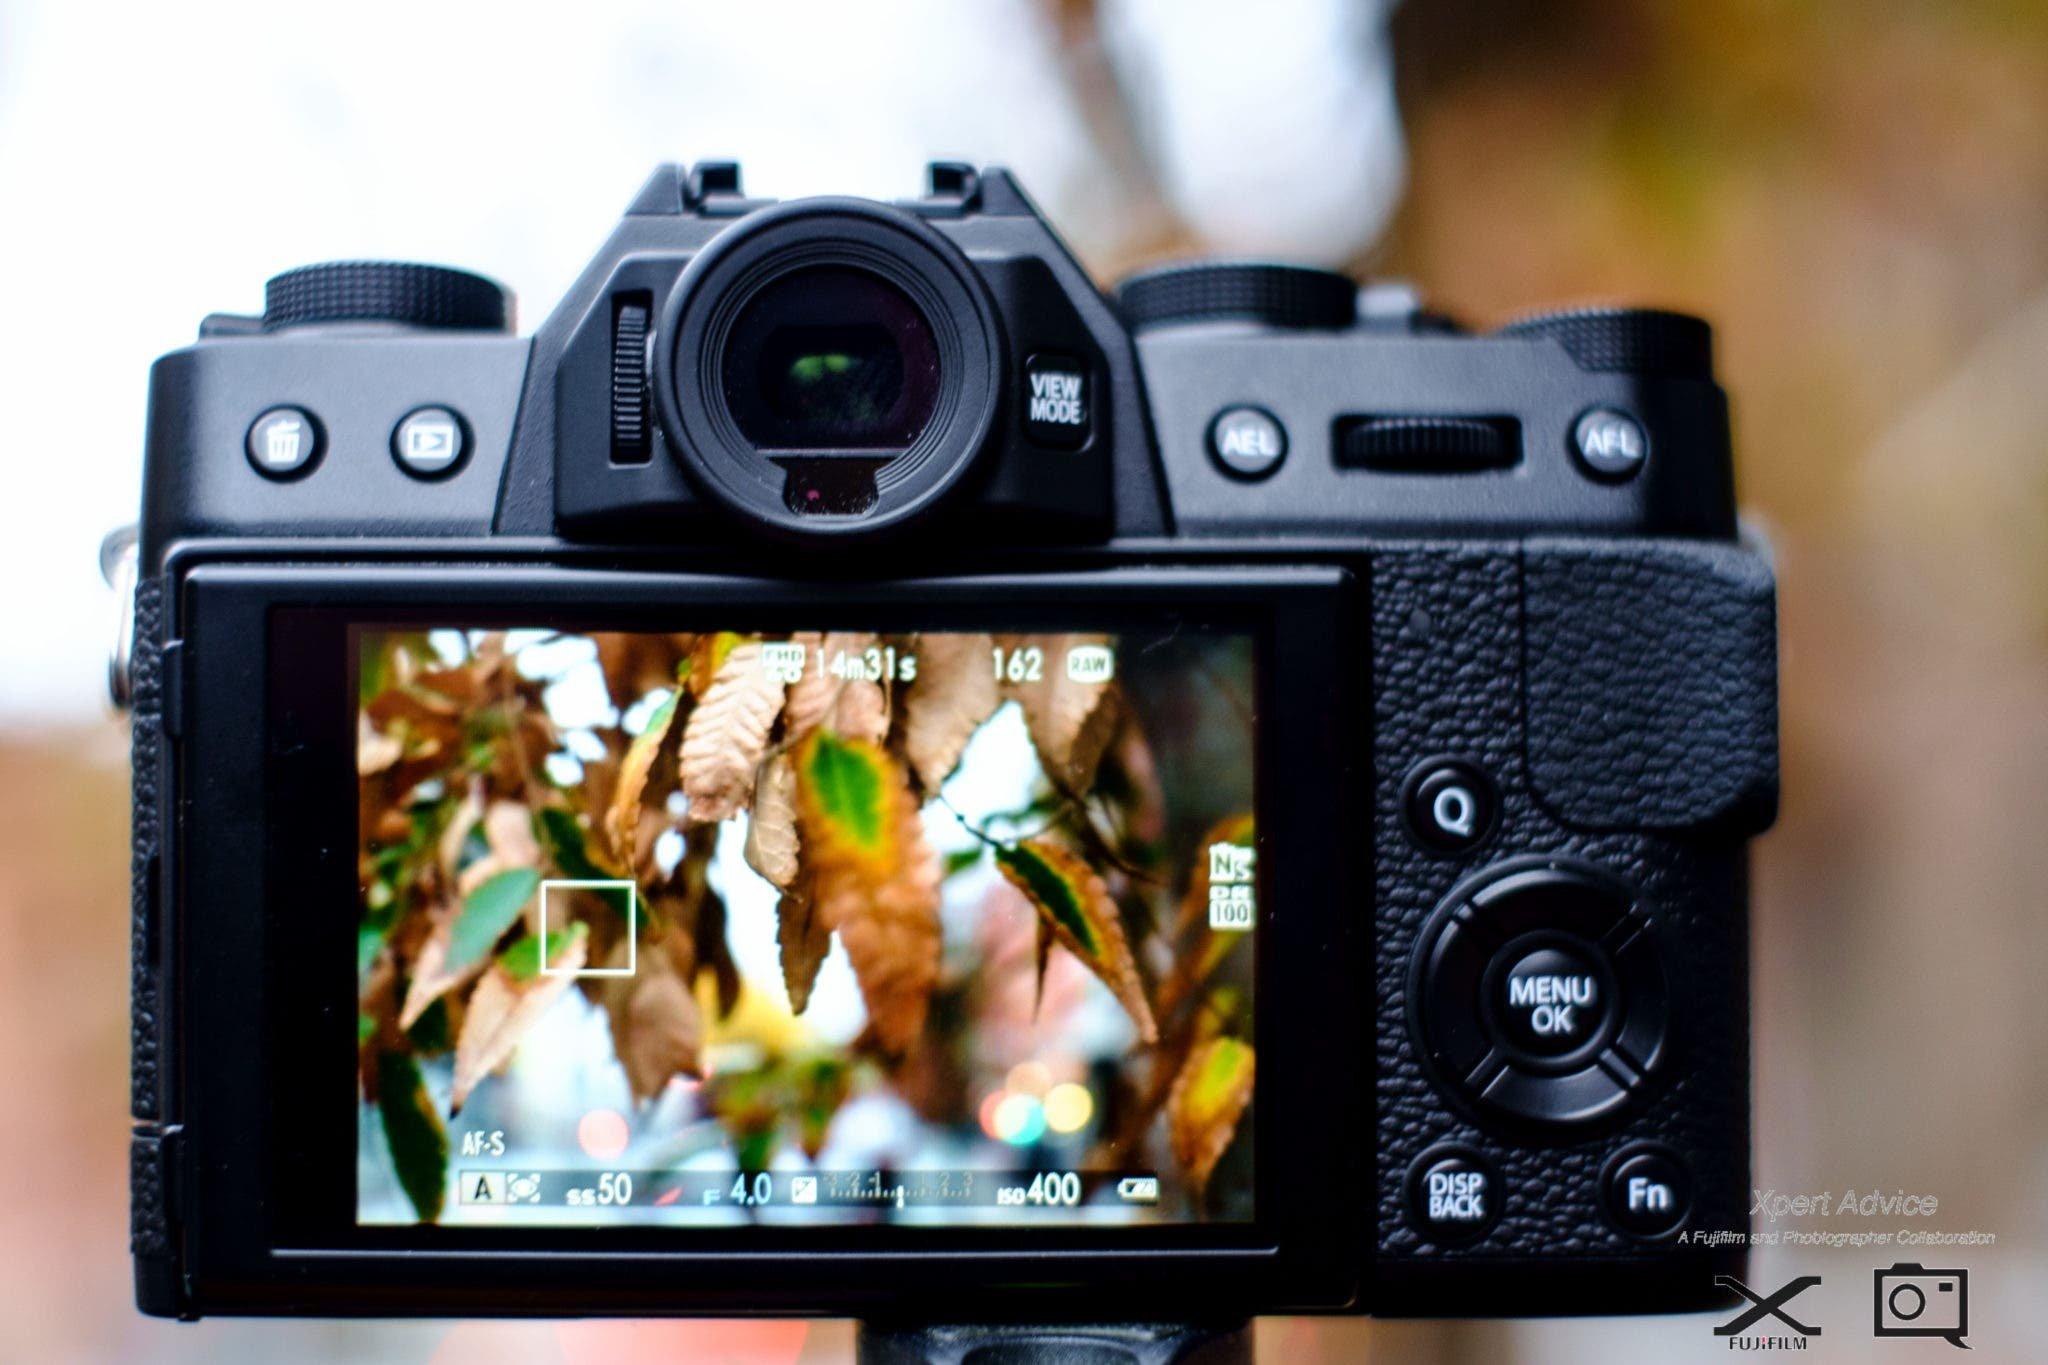 Capturing the Spirit of Fall Through Creative Photography